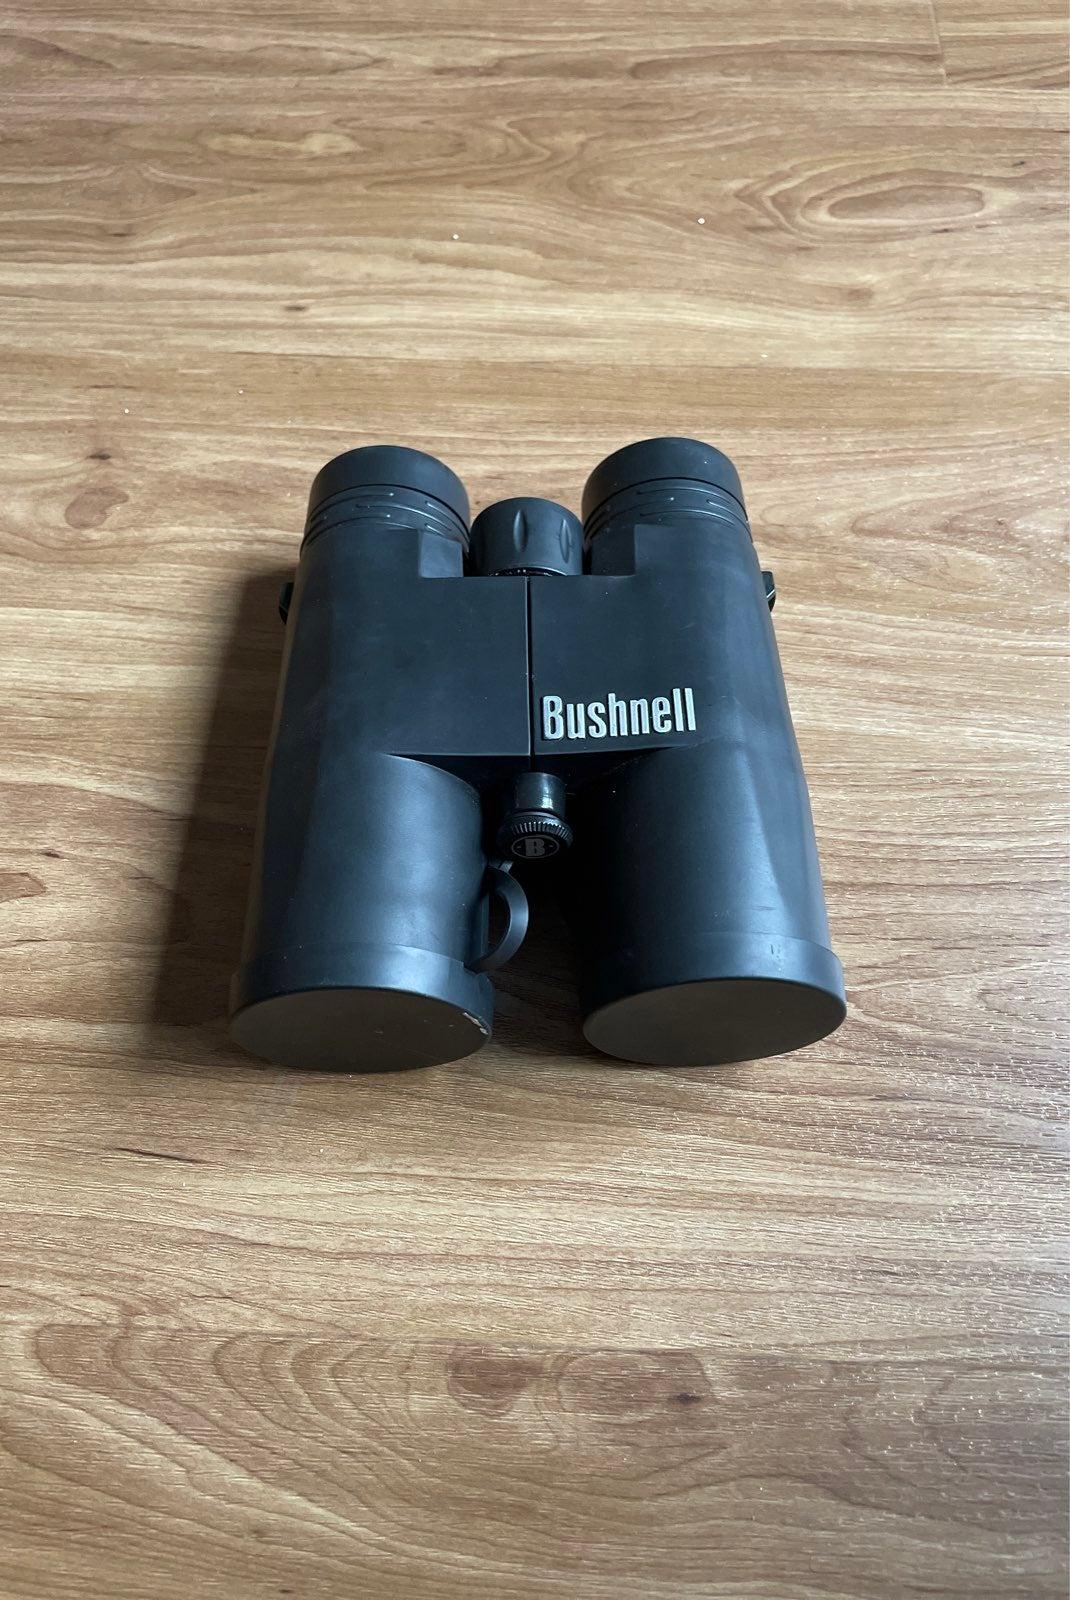 Bushnell 12x24 Binoculars